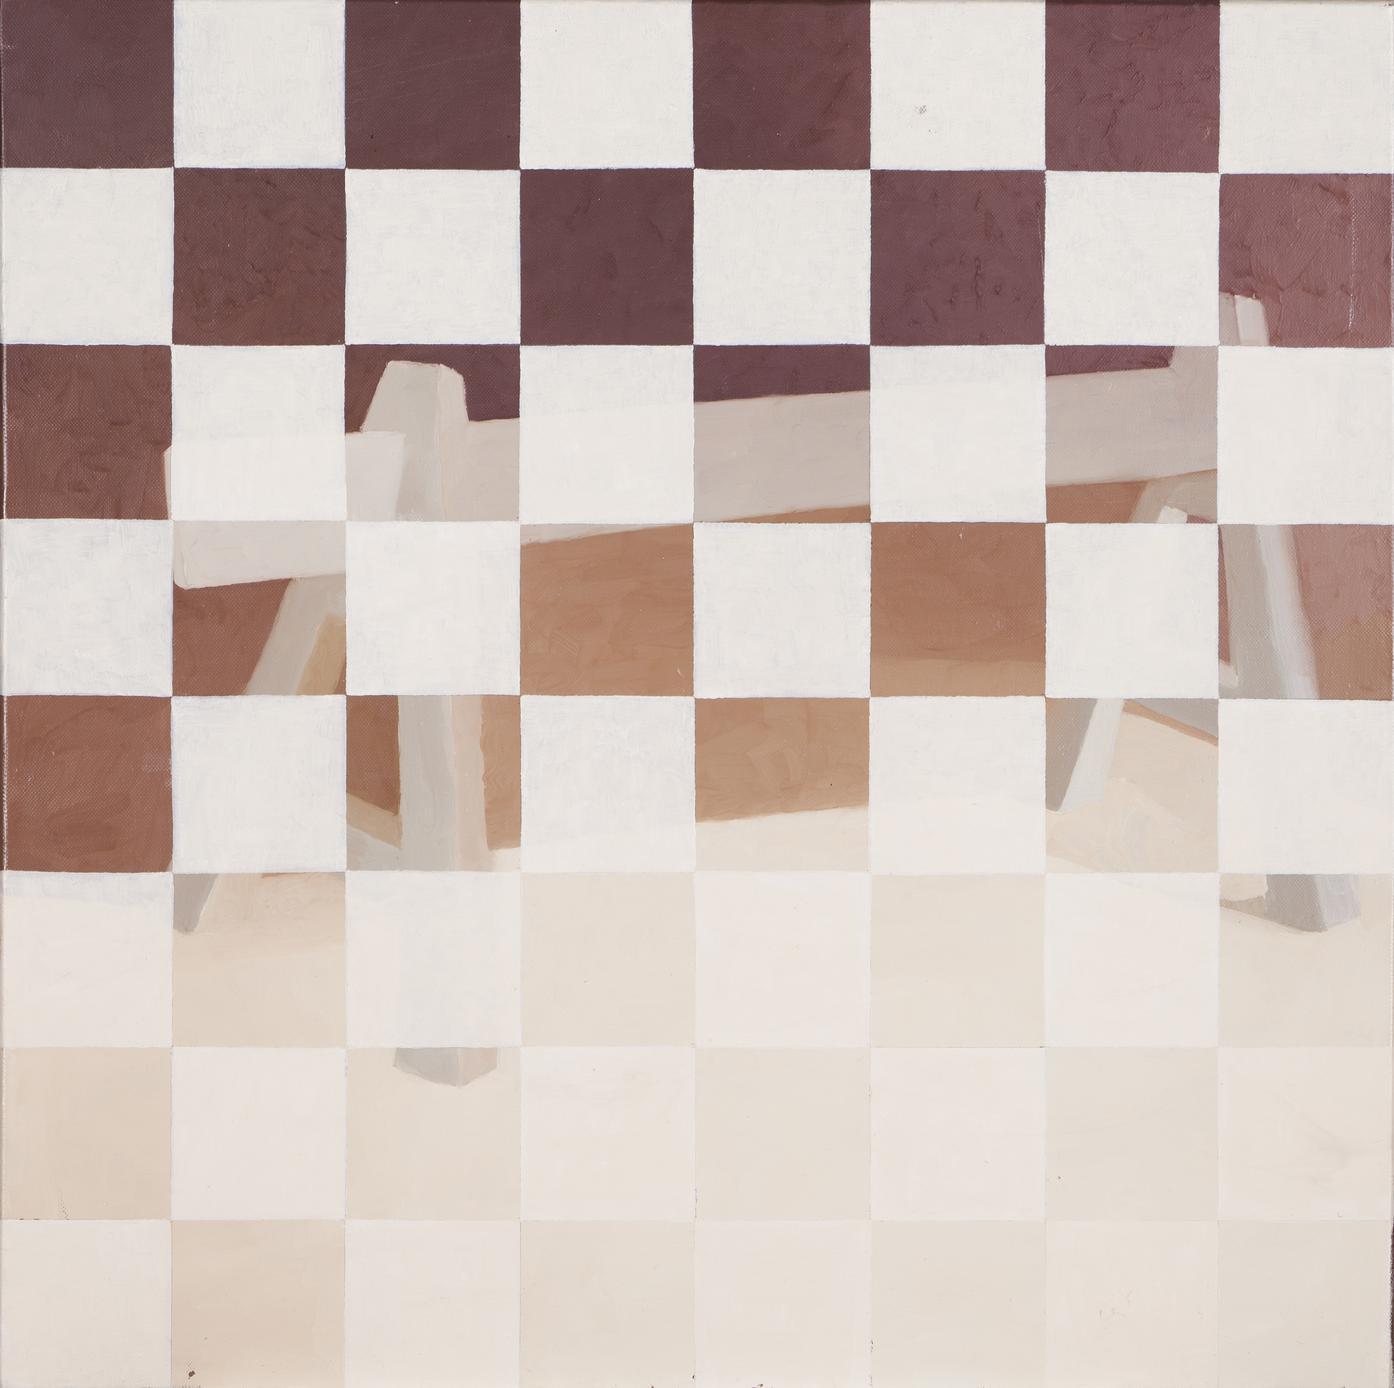 Ana Jotta - Untitled-2006